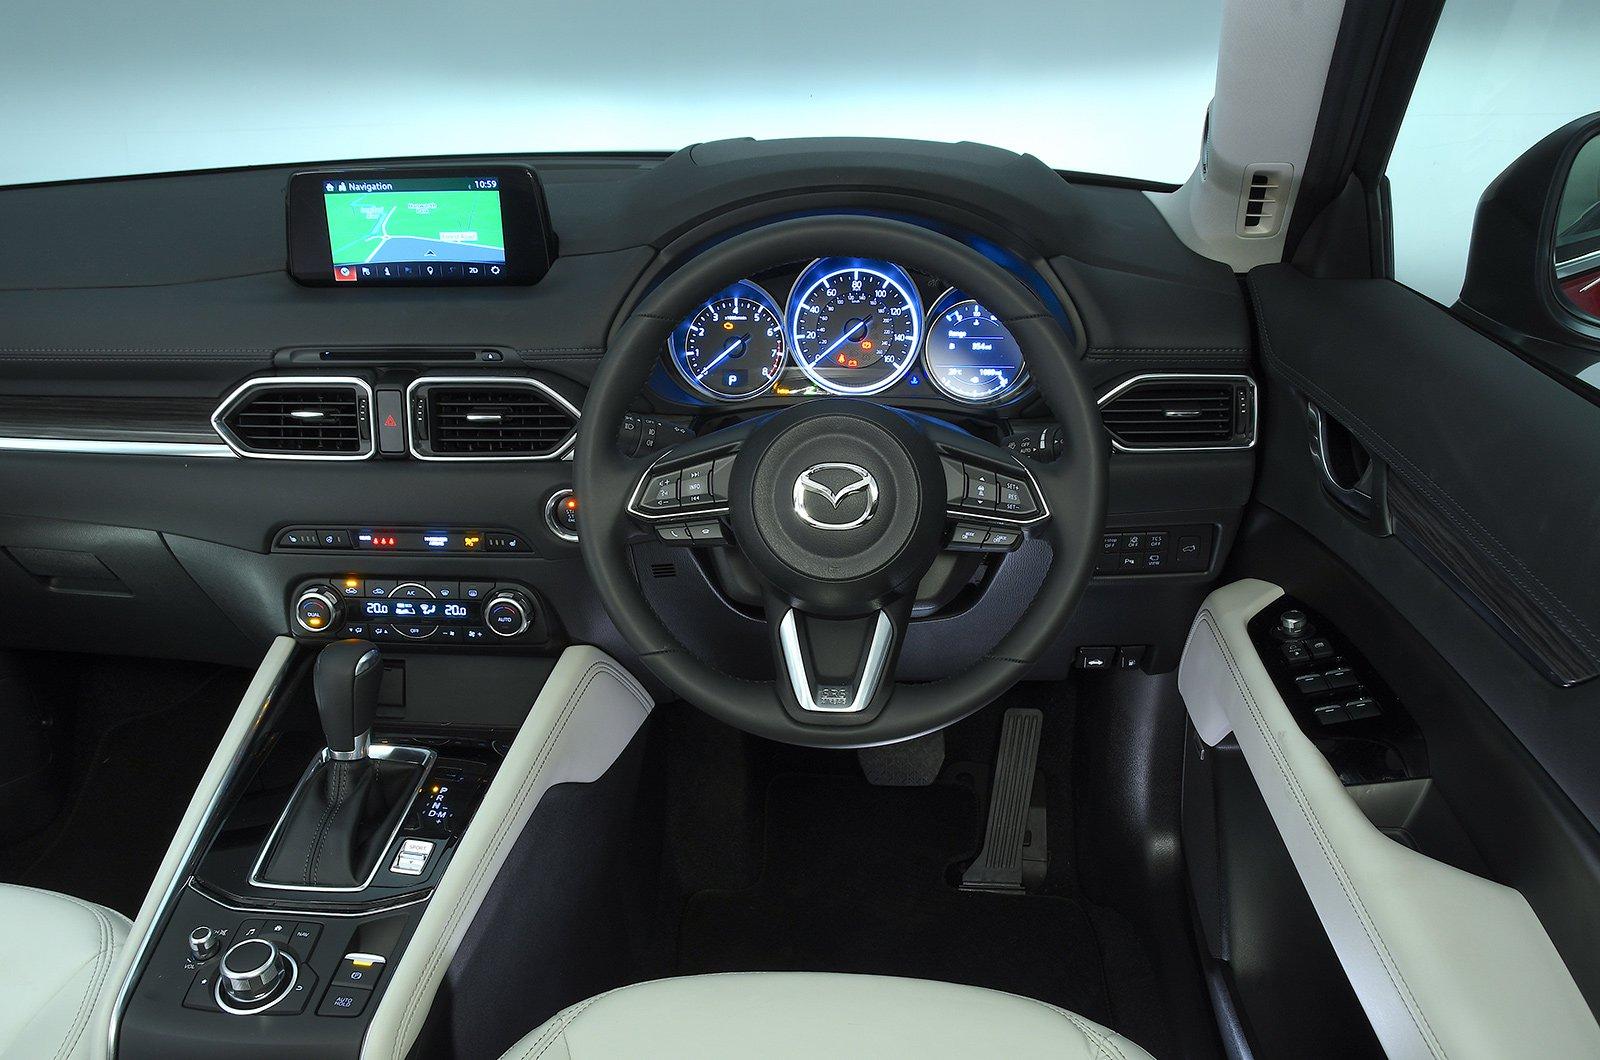 Mazda CX-5 2.2d SE-L Nav+ auto - interior